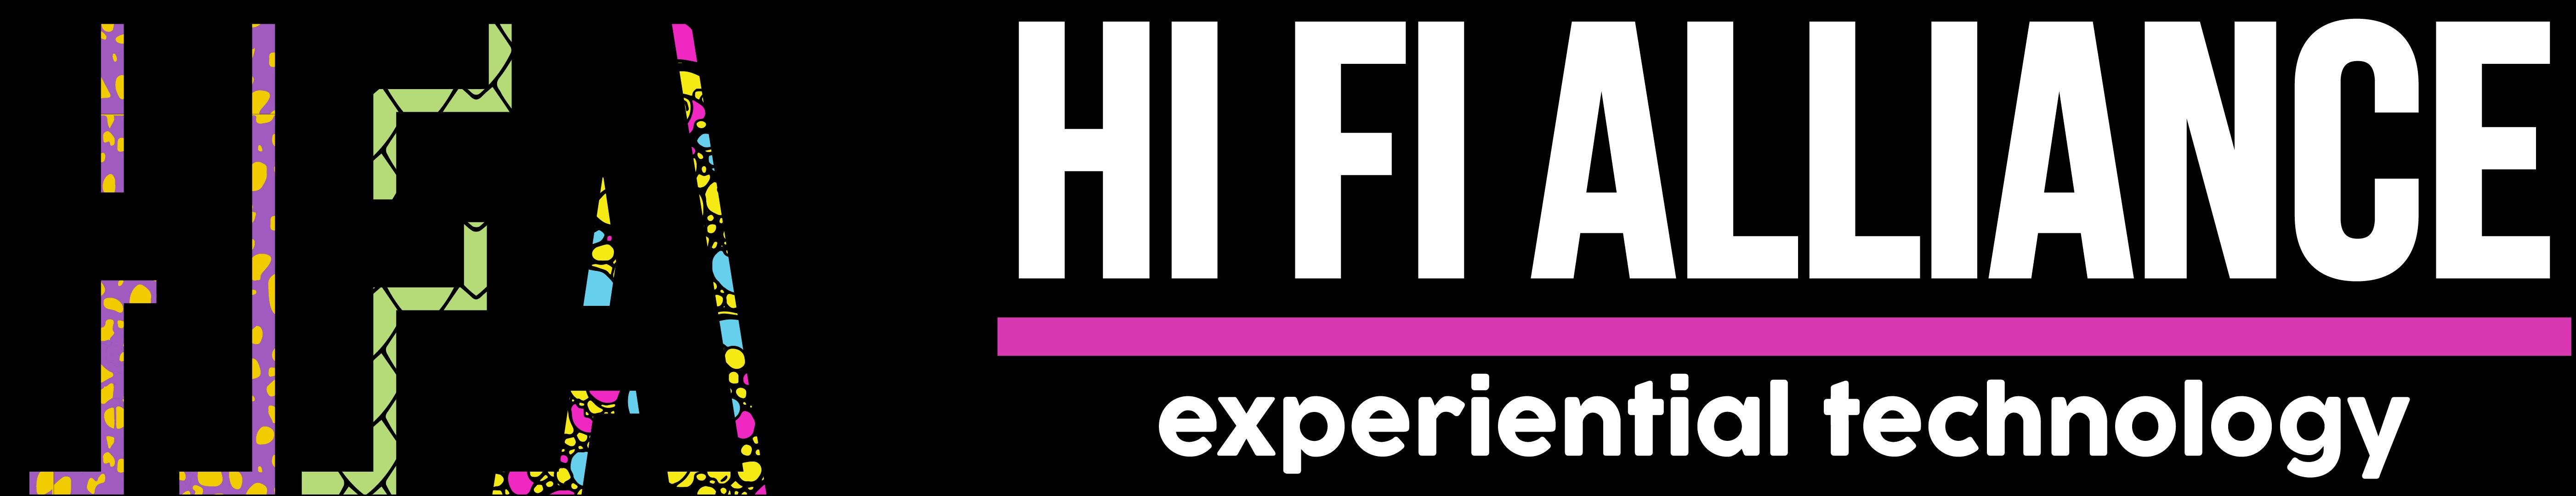 Hi Fi Alliance